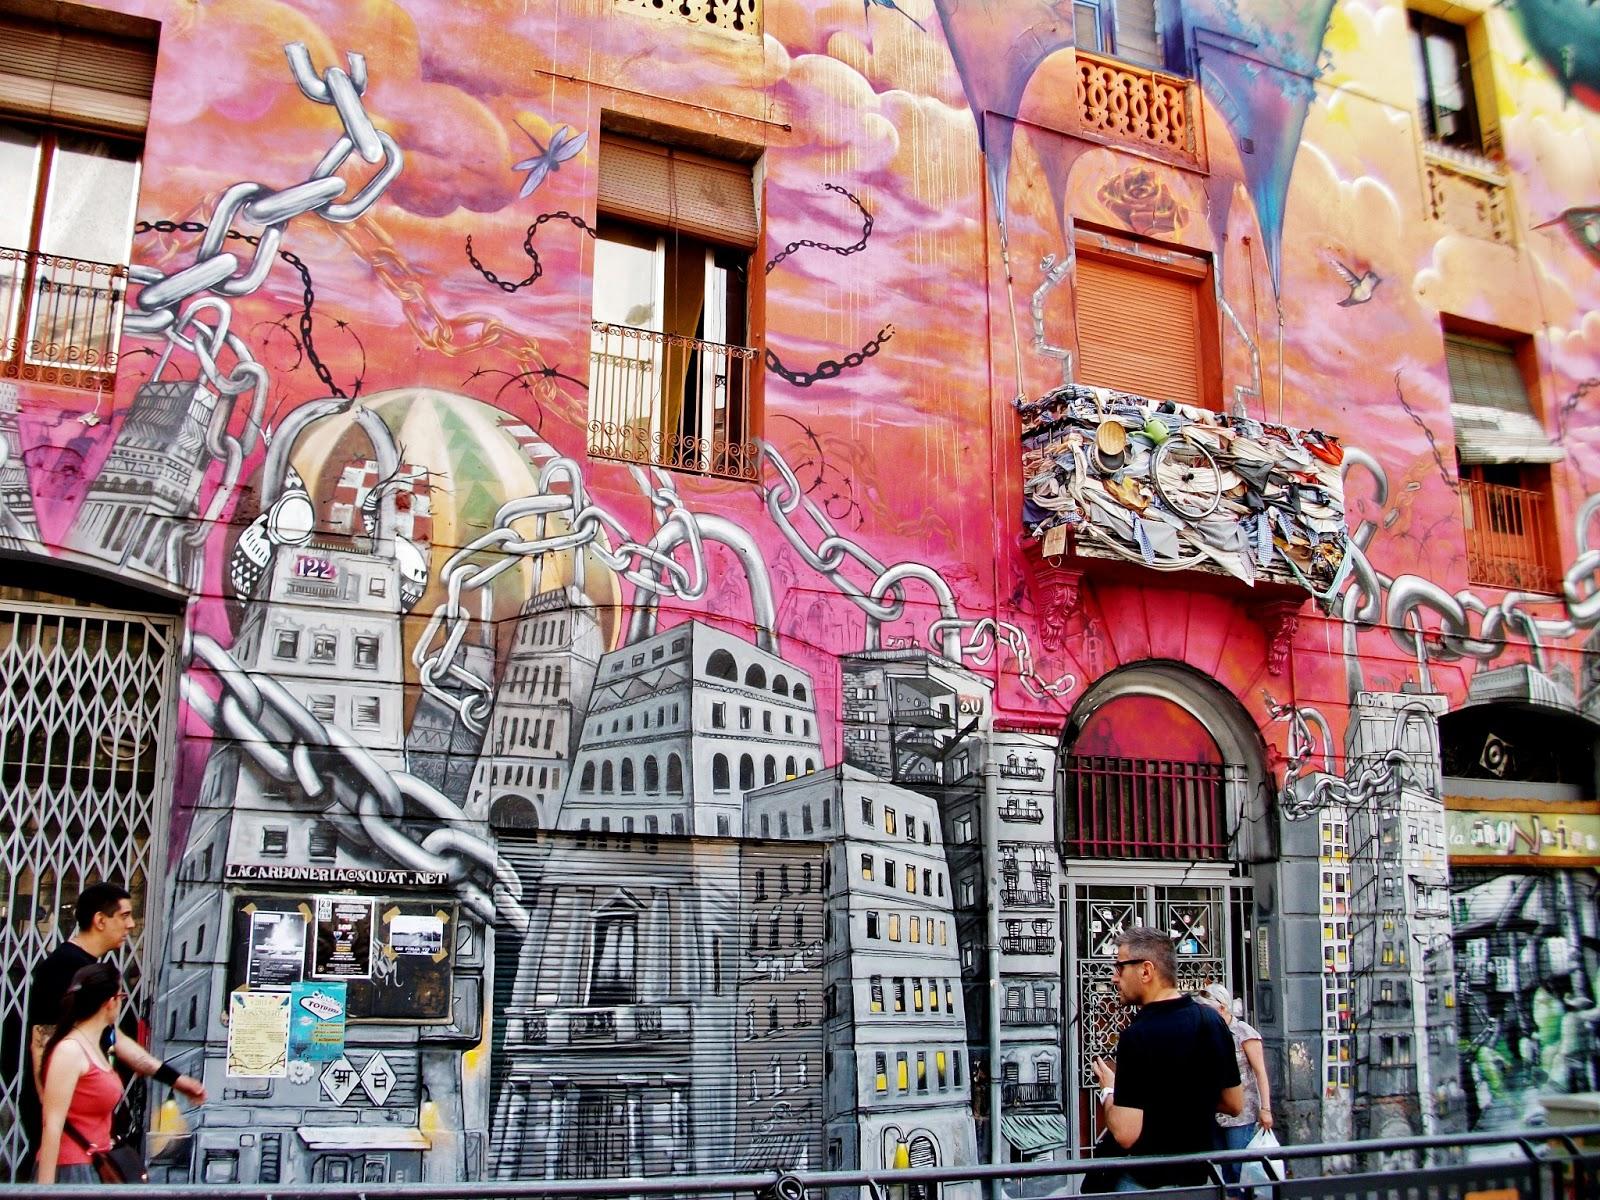 El mejor graffiti del mundo el blog de catalina for Graffitis y murales callejeros